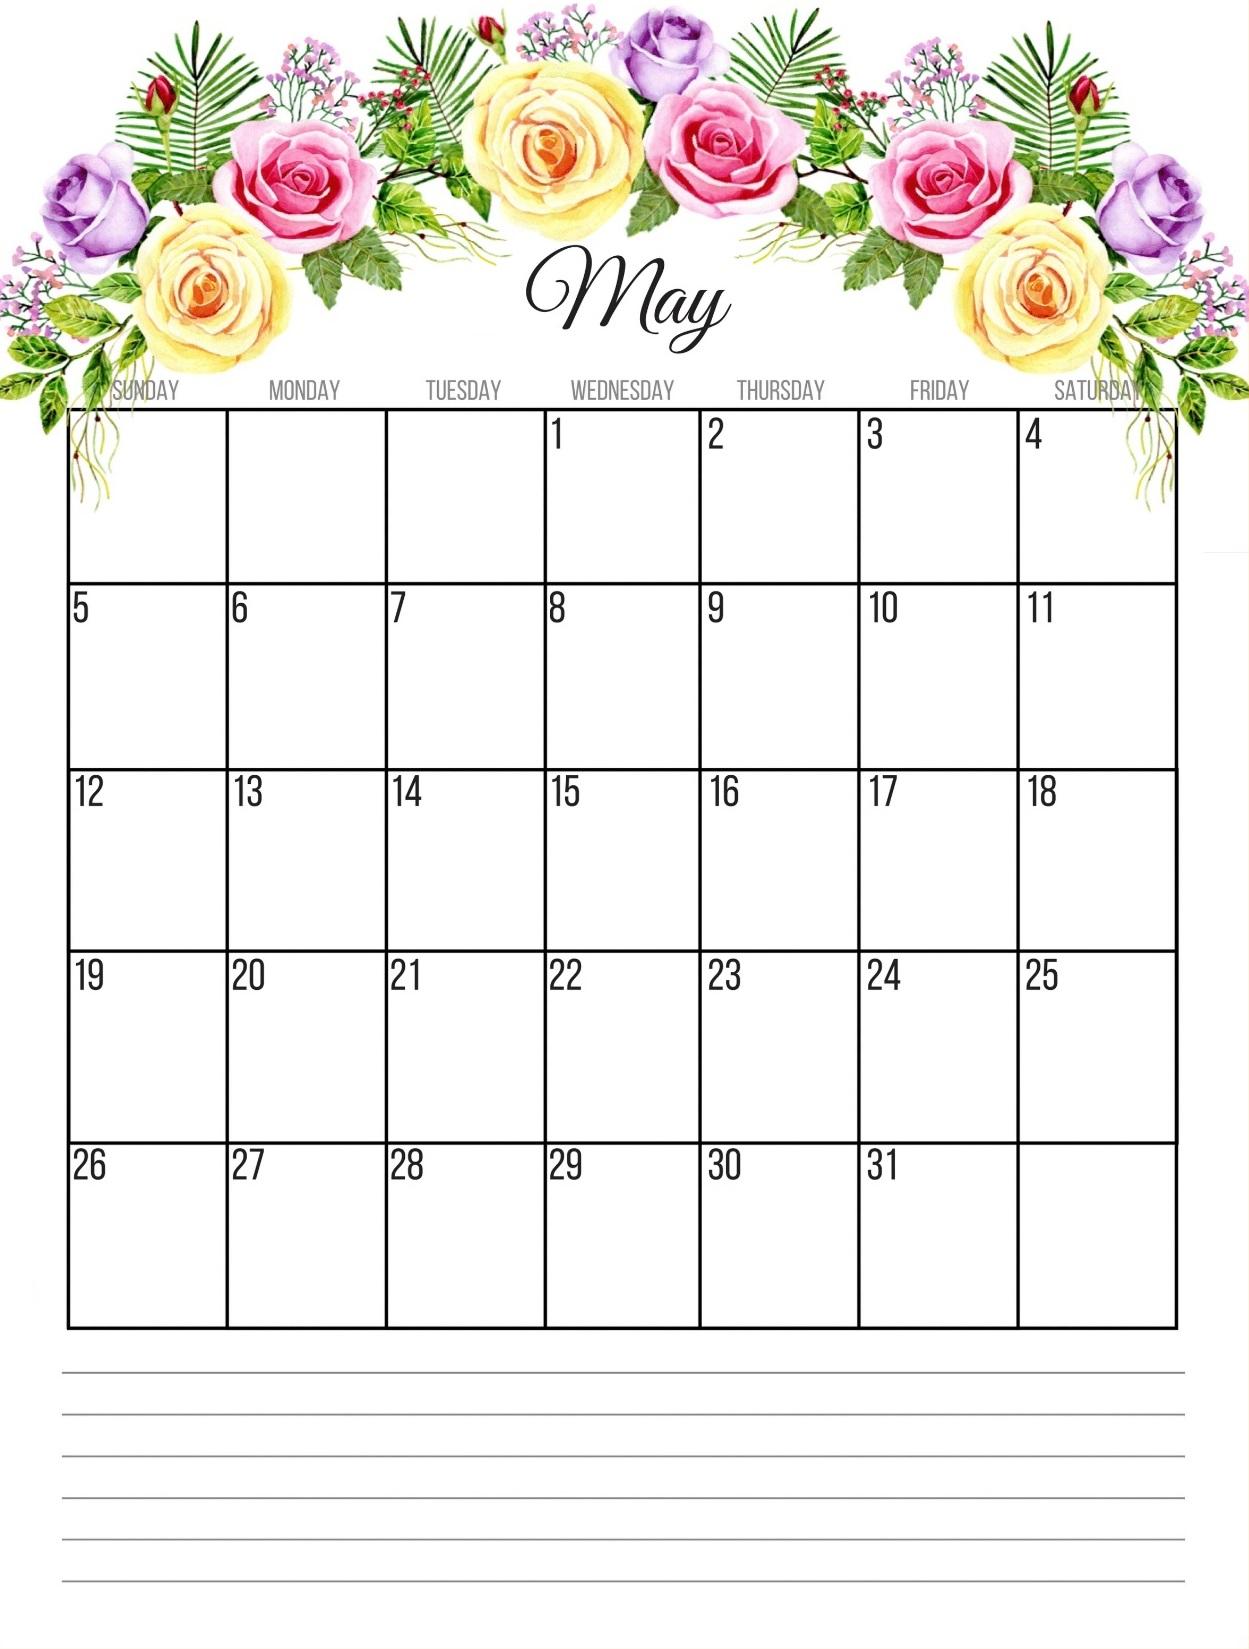 May 2019 Wall Calendar Template